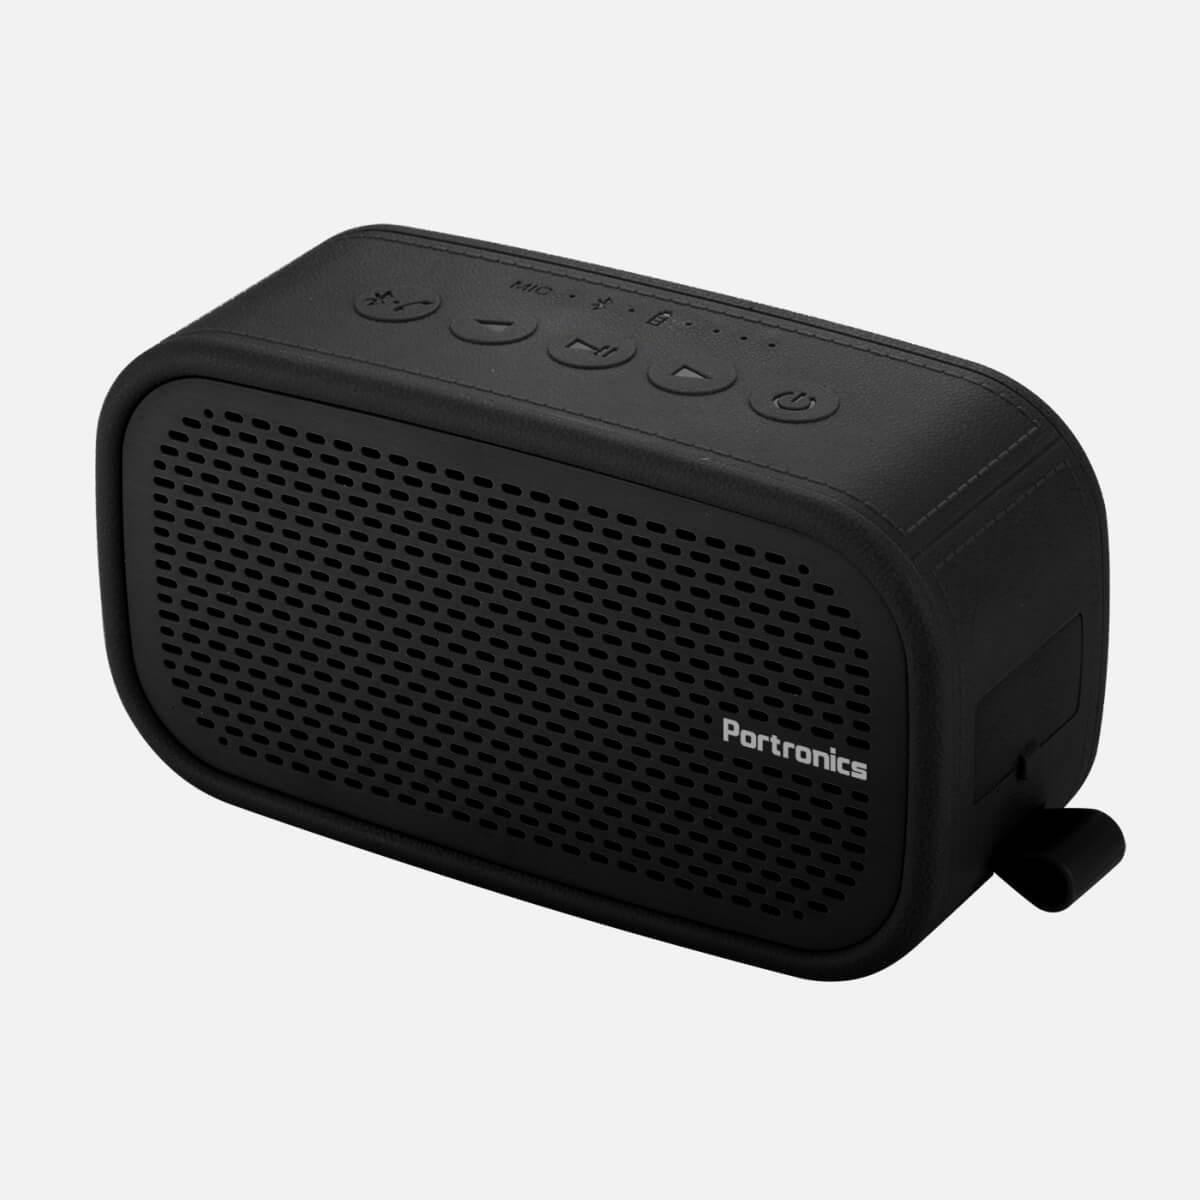 Portronics POSH II Portable Bluetooth Speaker